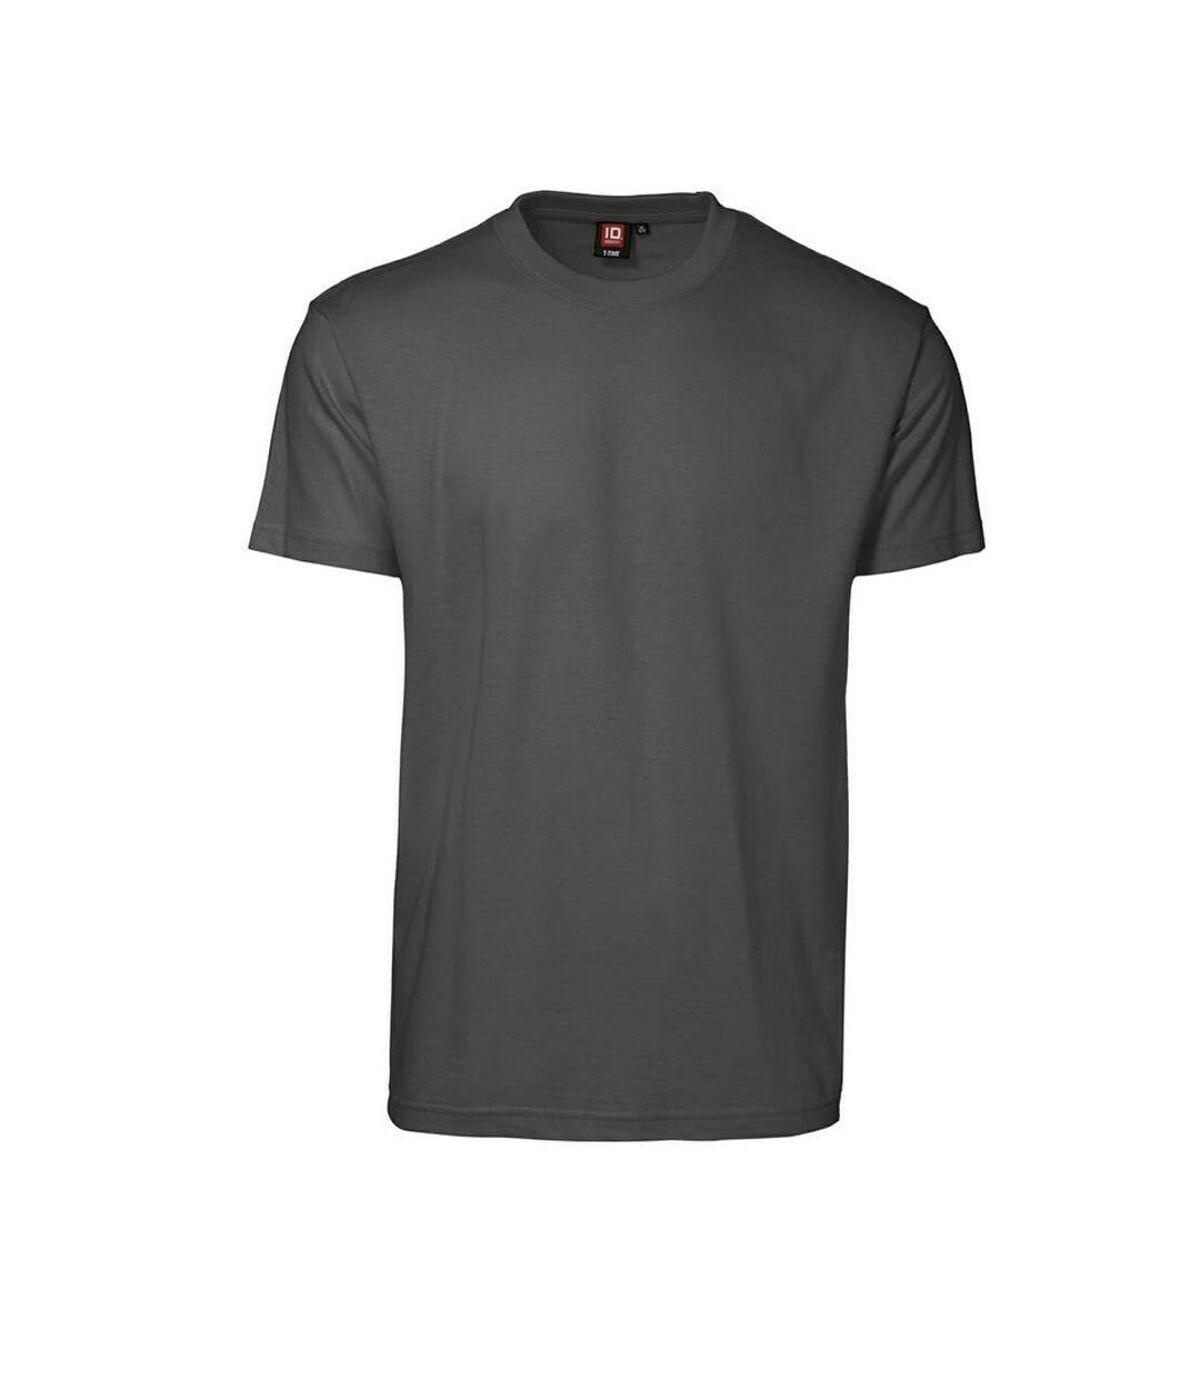 ID Mens T-Time Classic Regular Fitting Short Sleeve T-Shirt (Charcoal) - UTID268